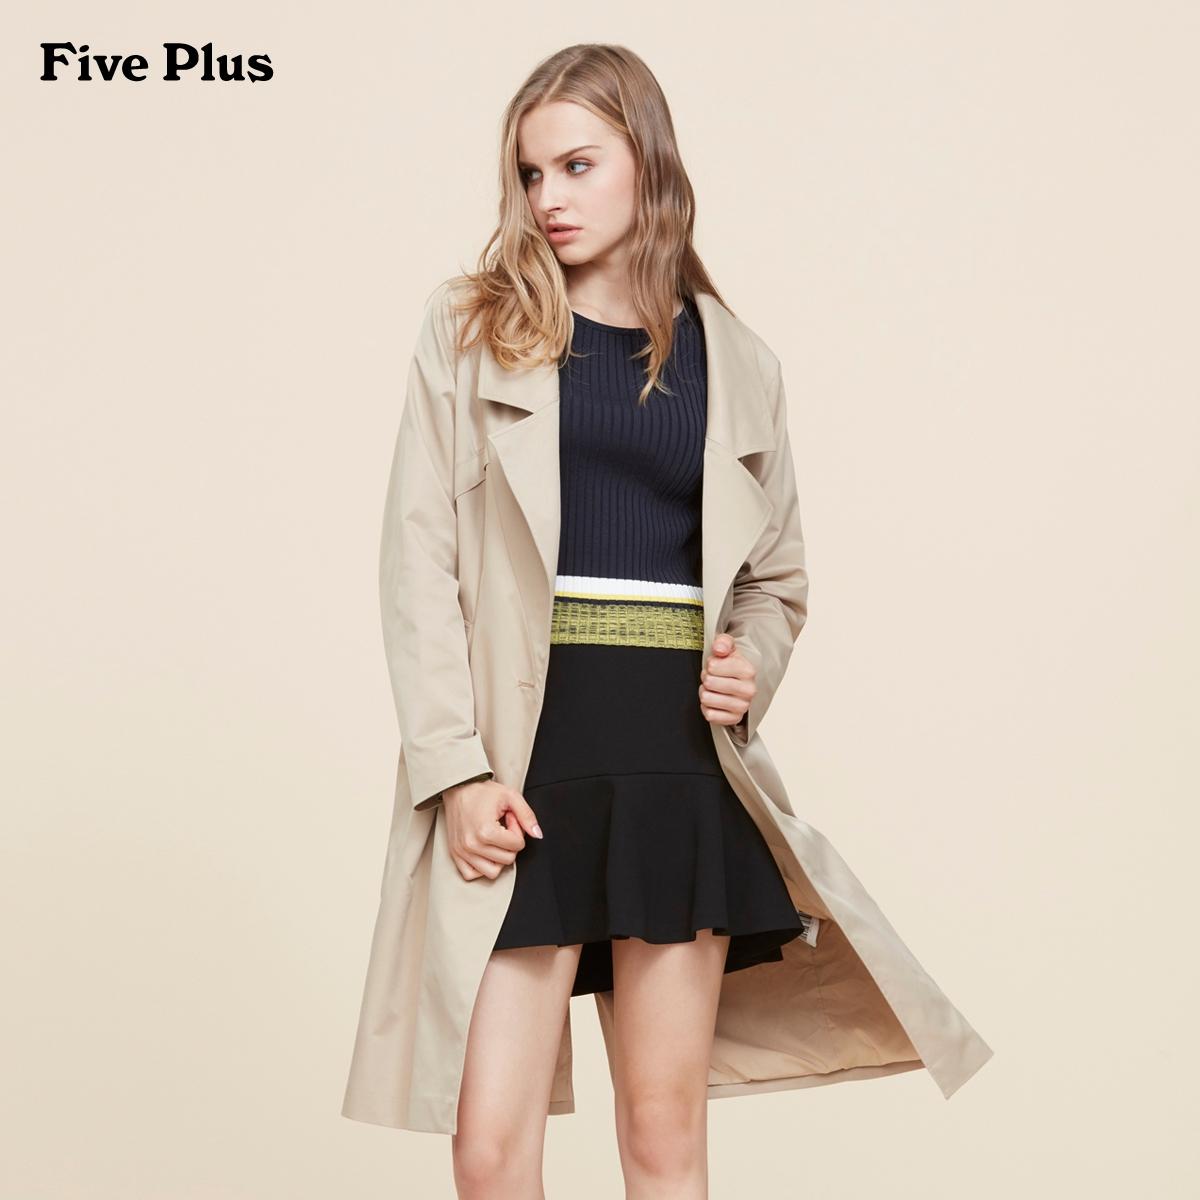 Five Plus新女装潮刺绣字母宽松长款西装领风衣外套2JM1052490